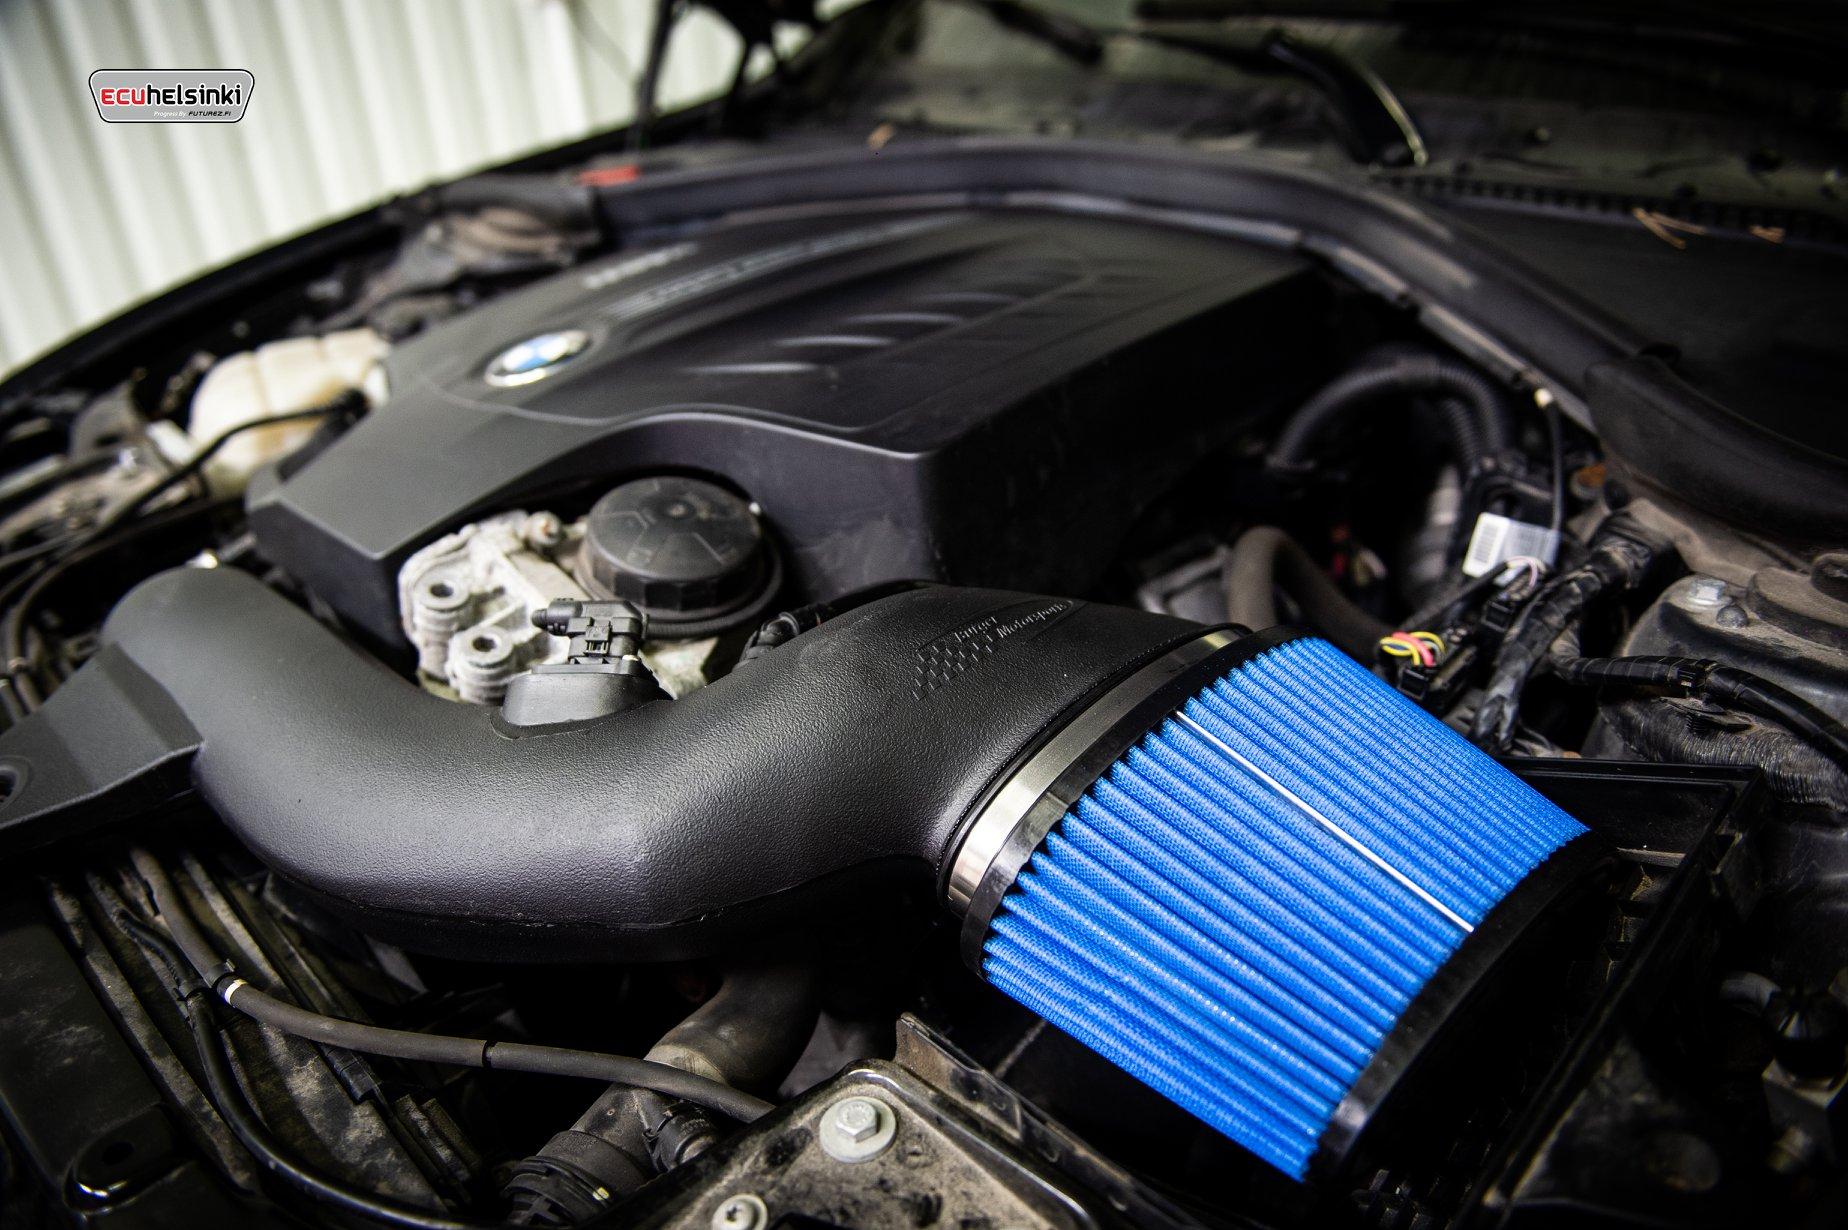 BMW 335i lastutus viritys celtic